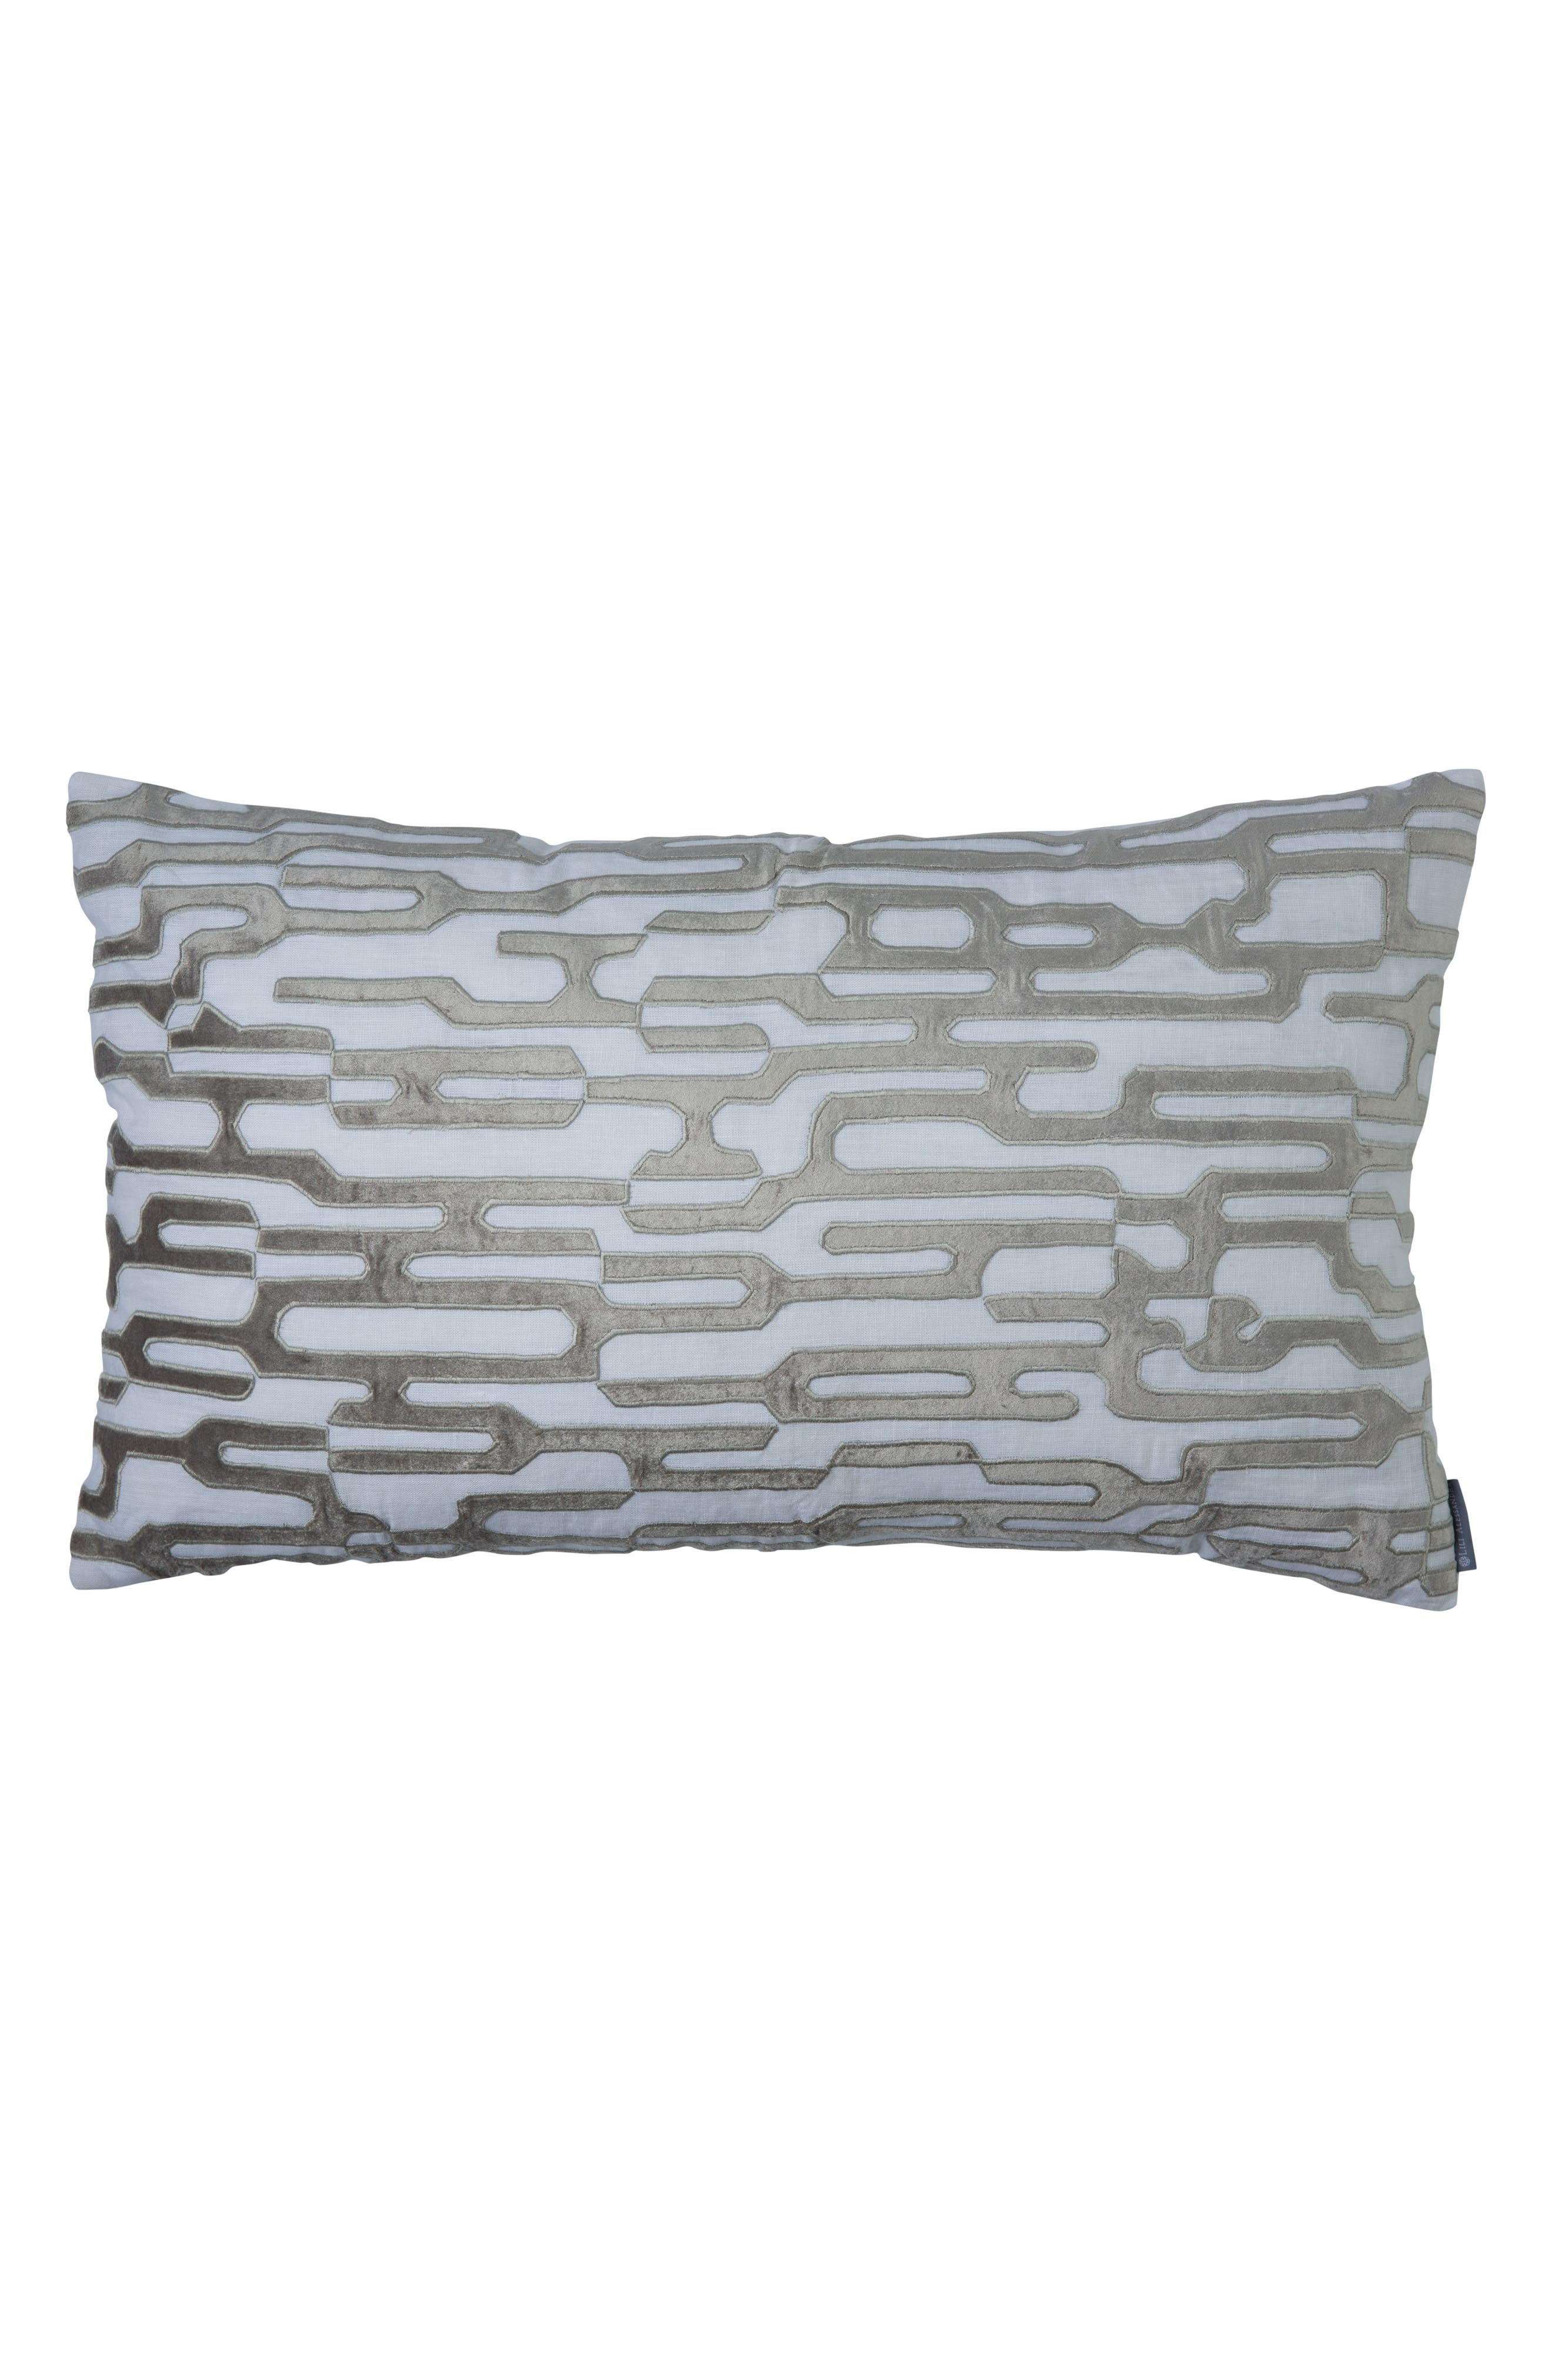 Christian Large Linen Velvet Accent Pillow,                             Main thumbnail 1, color,                             GRAY